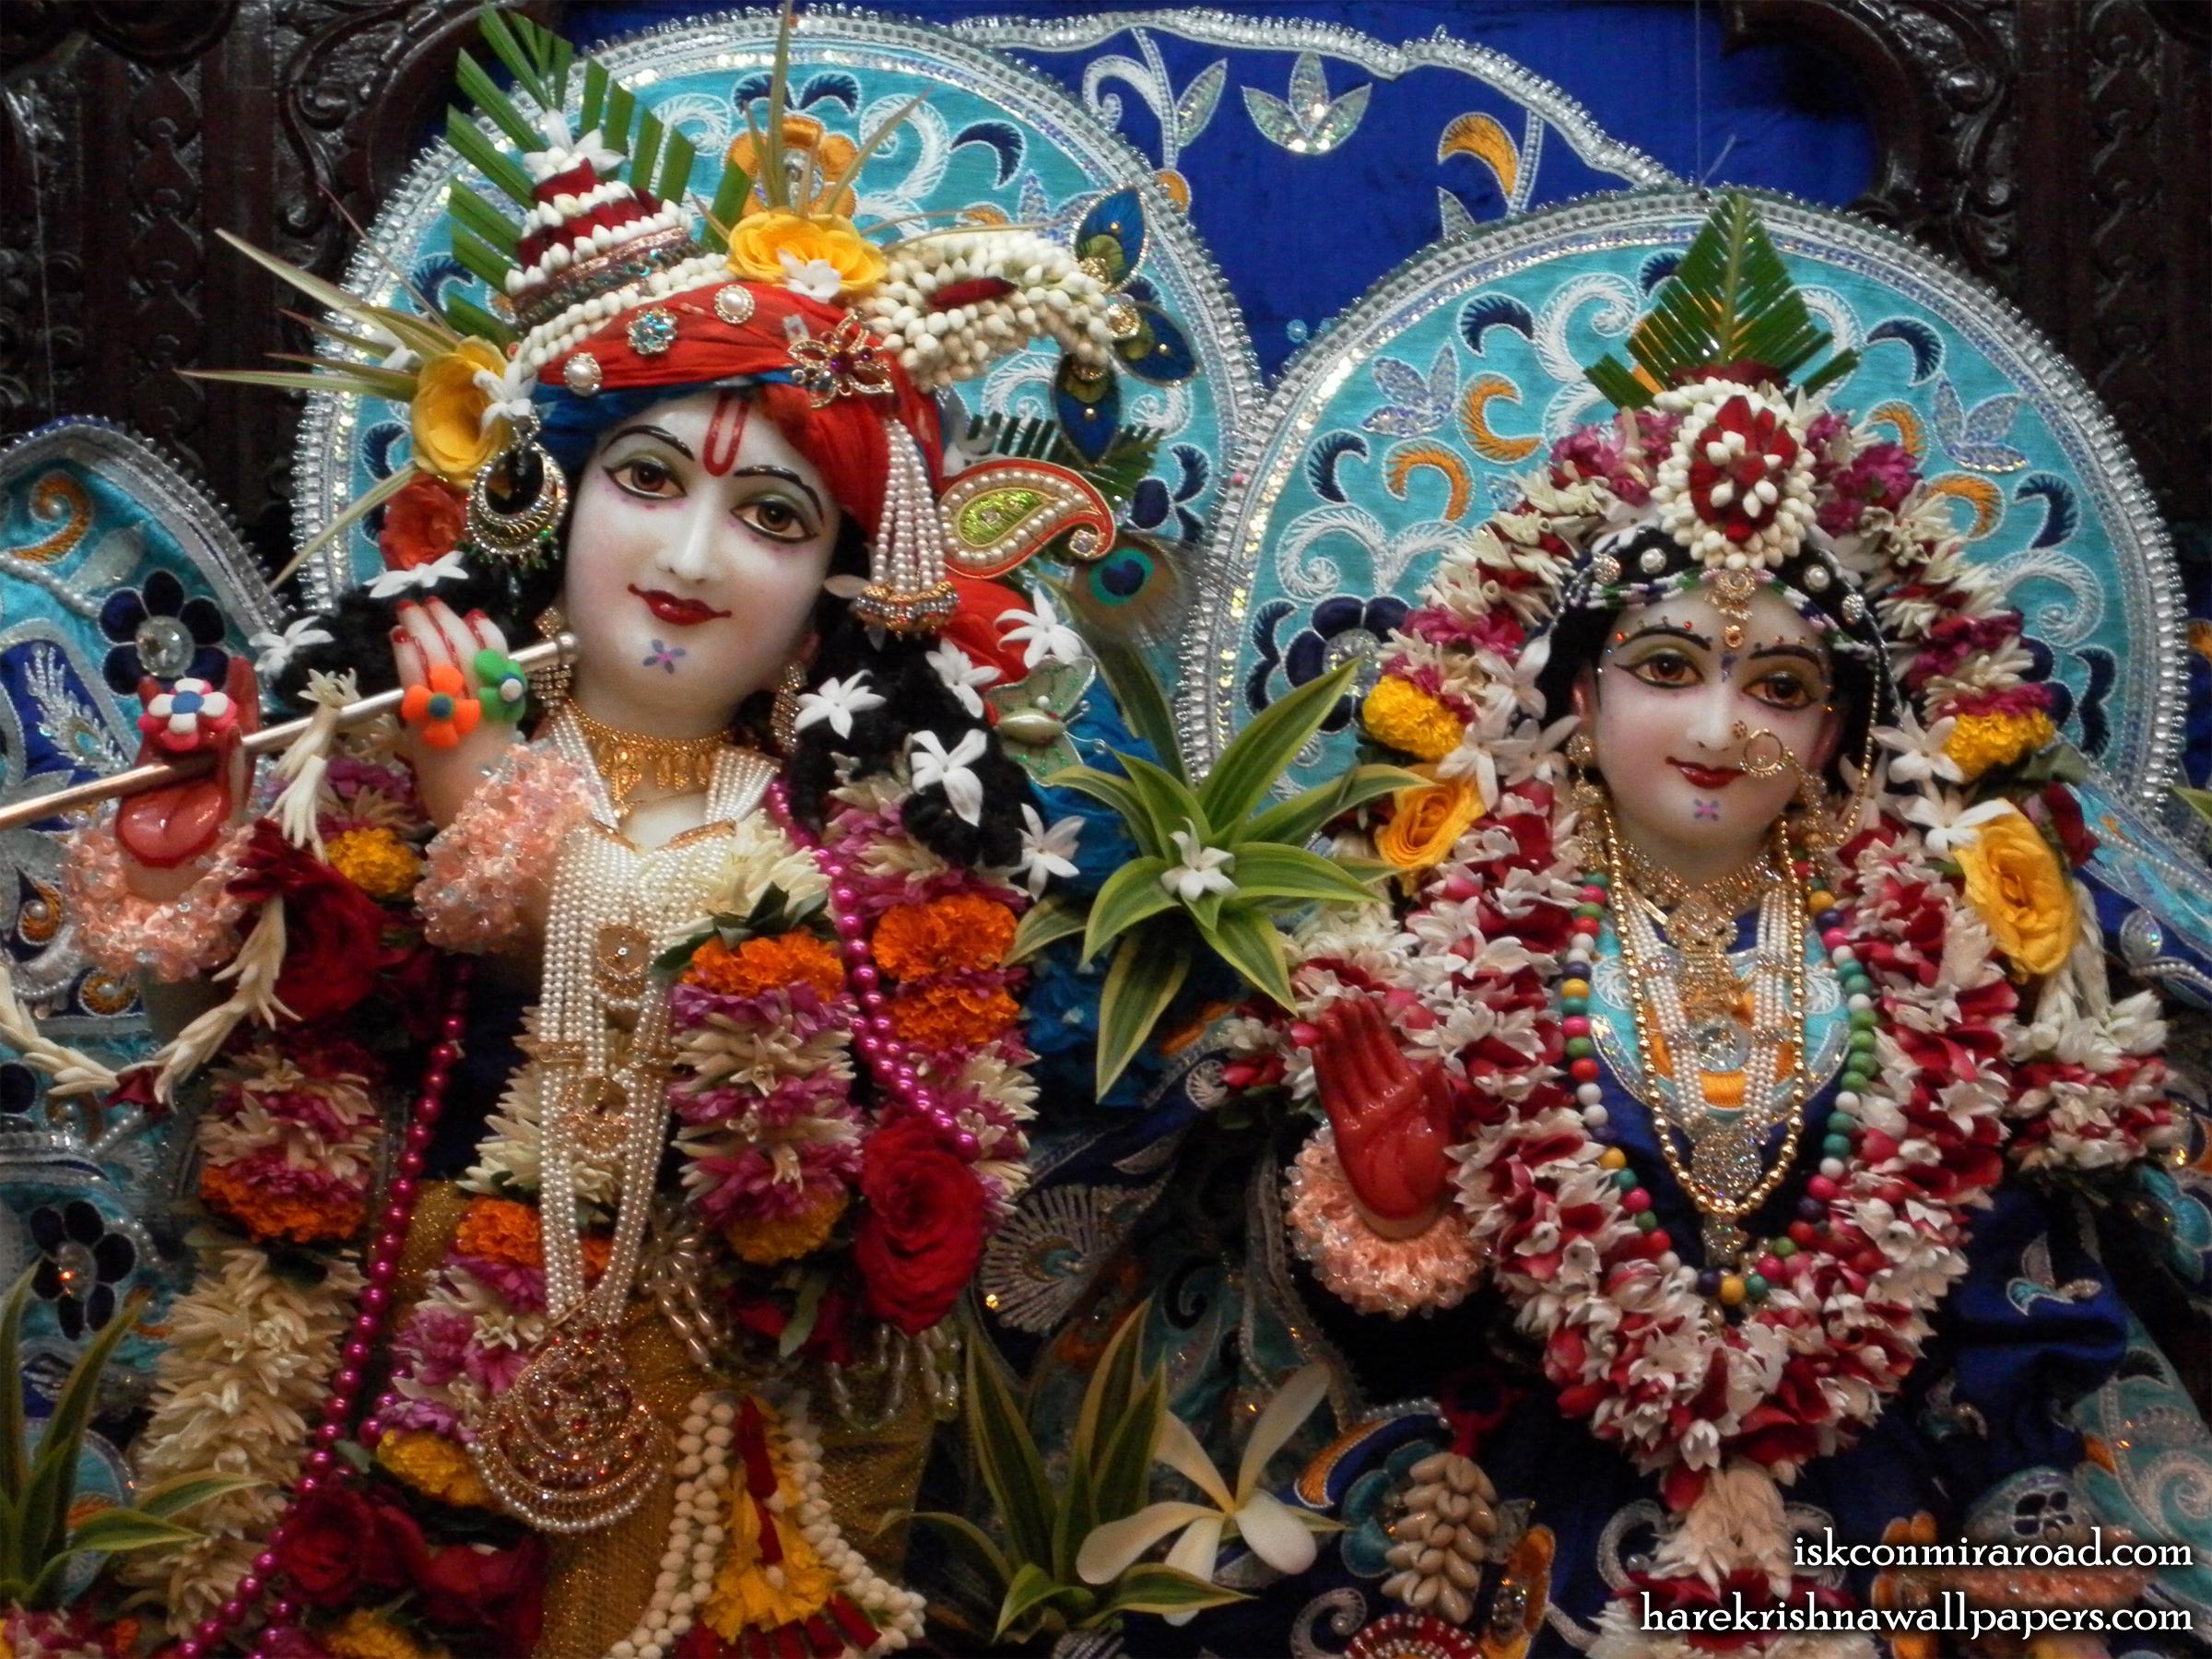 Sri Sri Radha Giridhari Close up Wallpaper (014) Size 2400x1800 Download